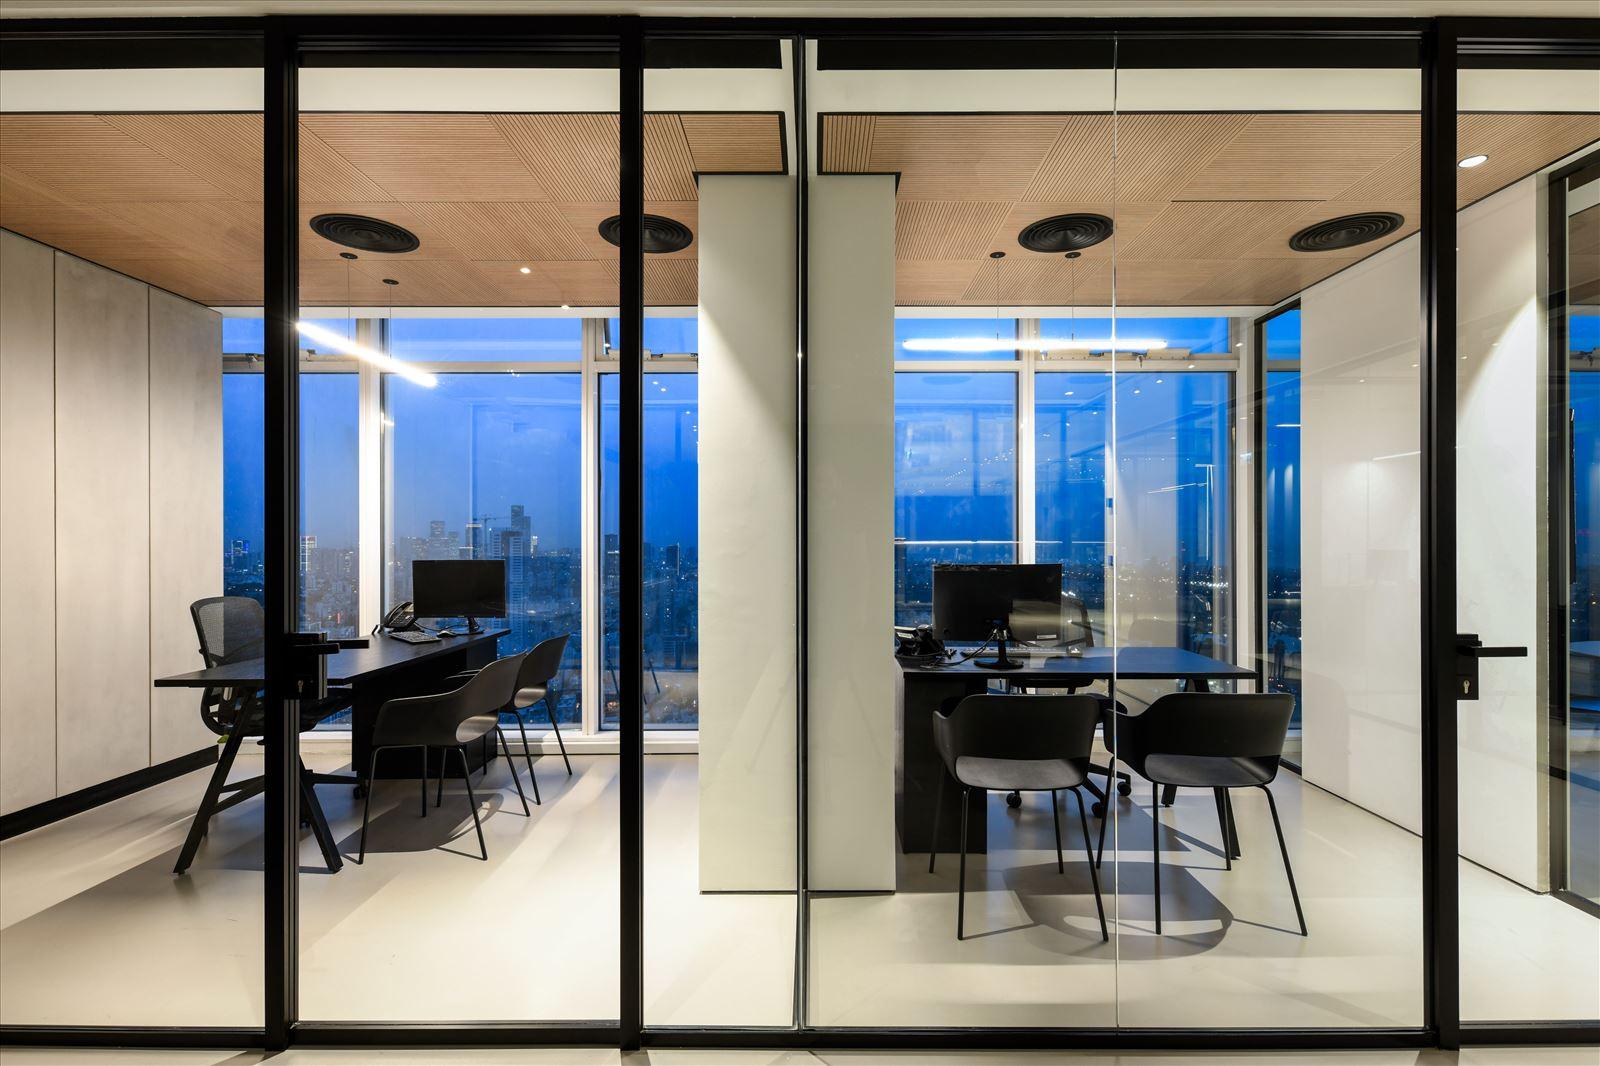 Divident office עיצוב גופי תאורה מעל שולחן המשרד נעשה על ידי קמחי תאורה